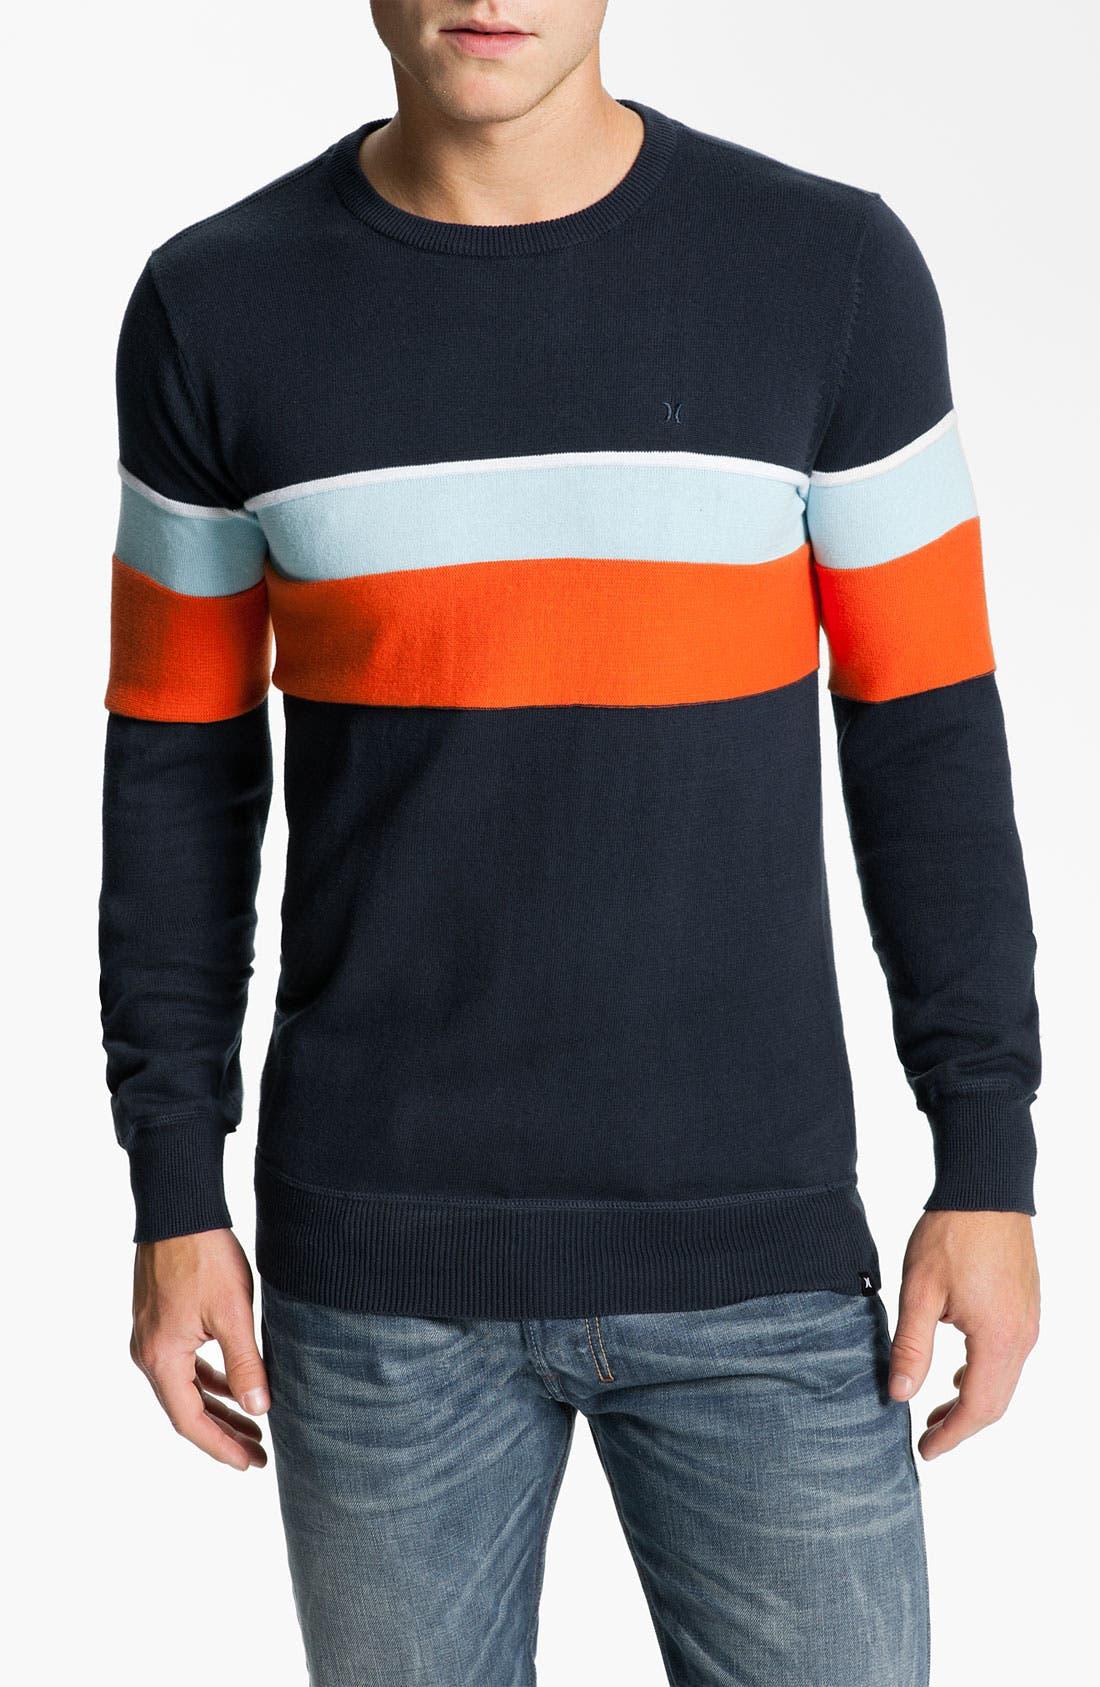 Alternate Image 1 Selected - Hurley 'Hanger' Stripe Crewneck Sweater